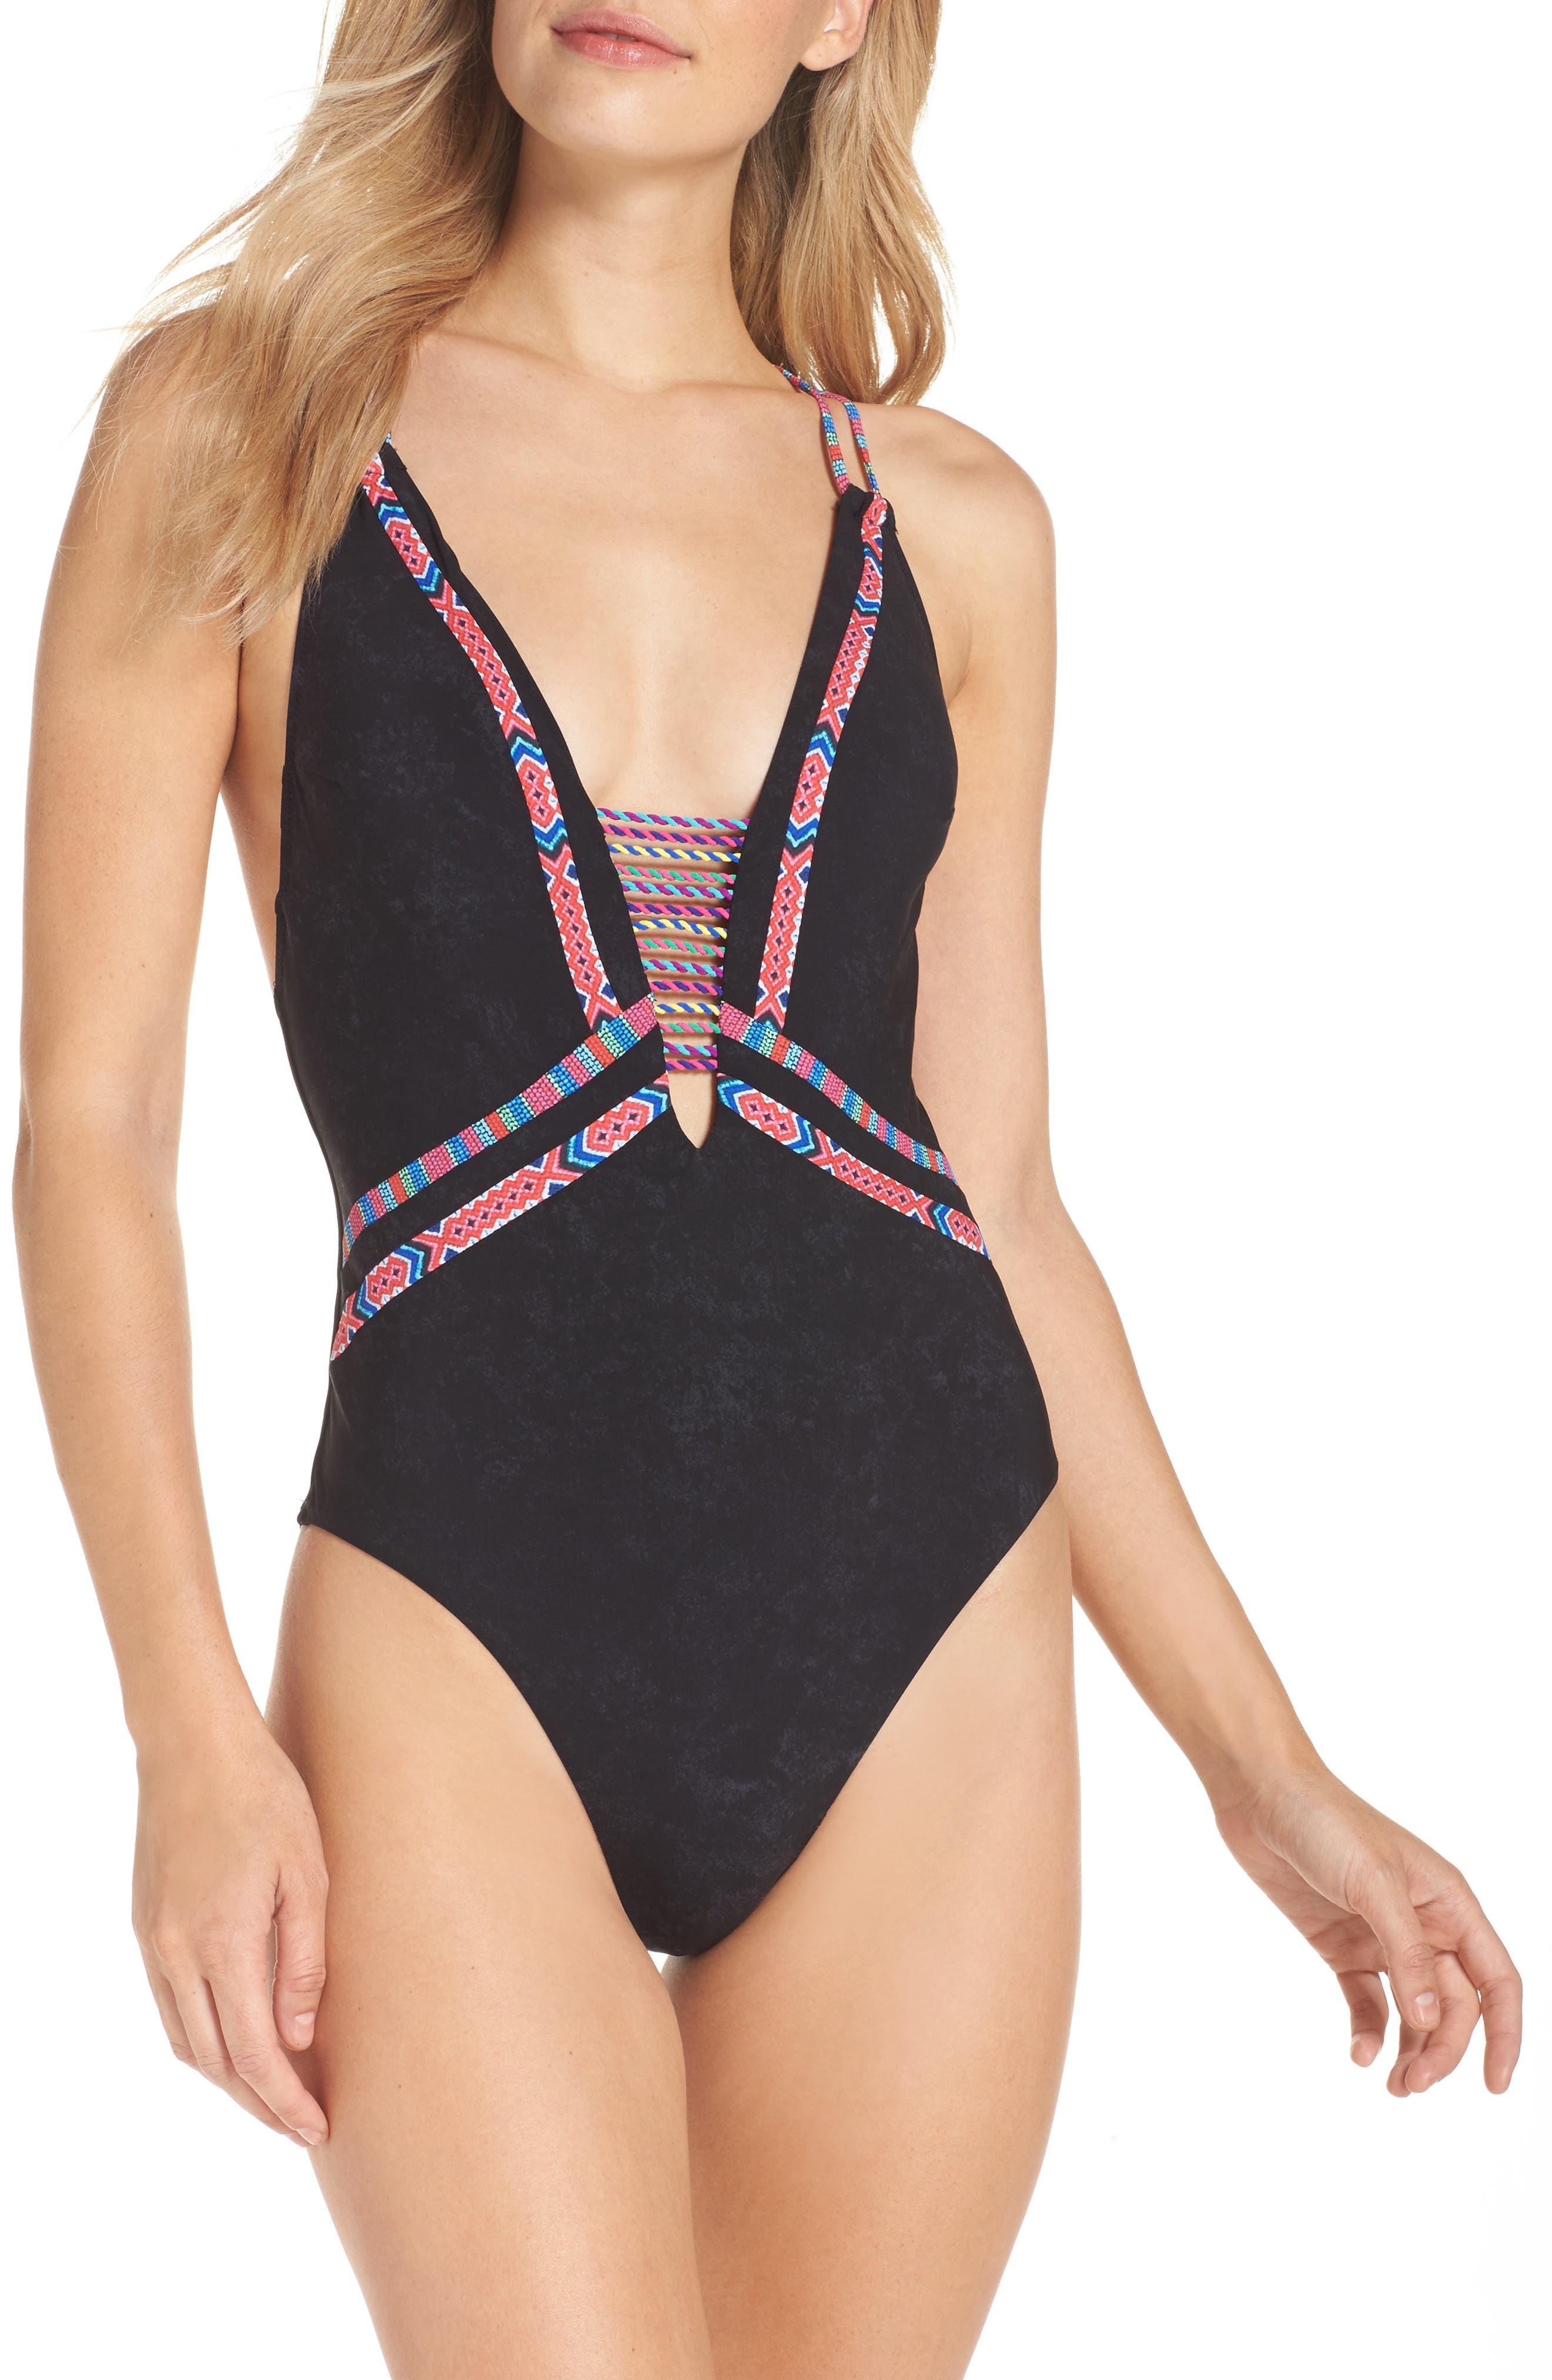 Main Image - Nanette Lepore Cha Cha Cha Goddess One-Piece Swimsuit